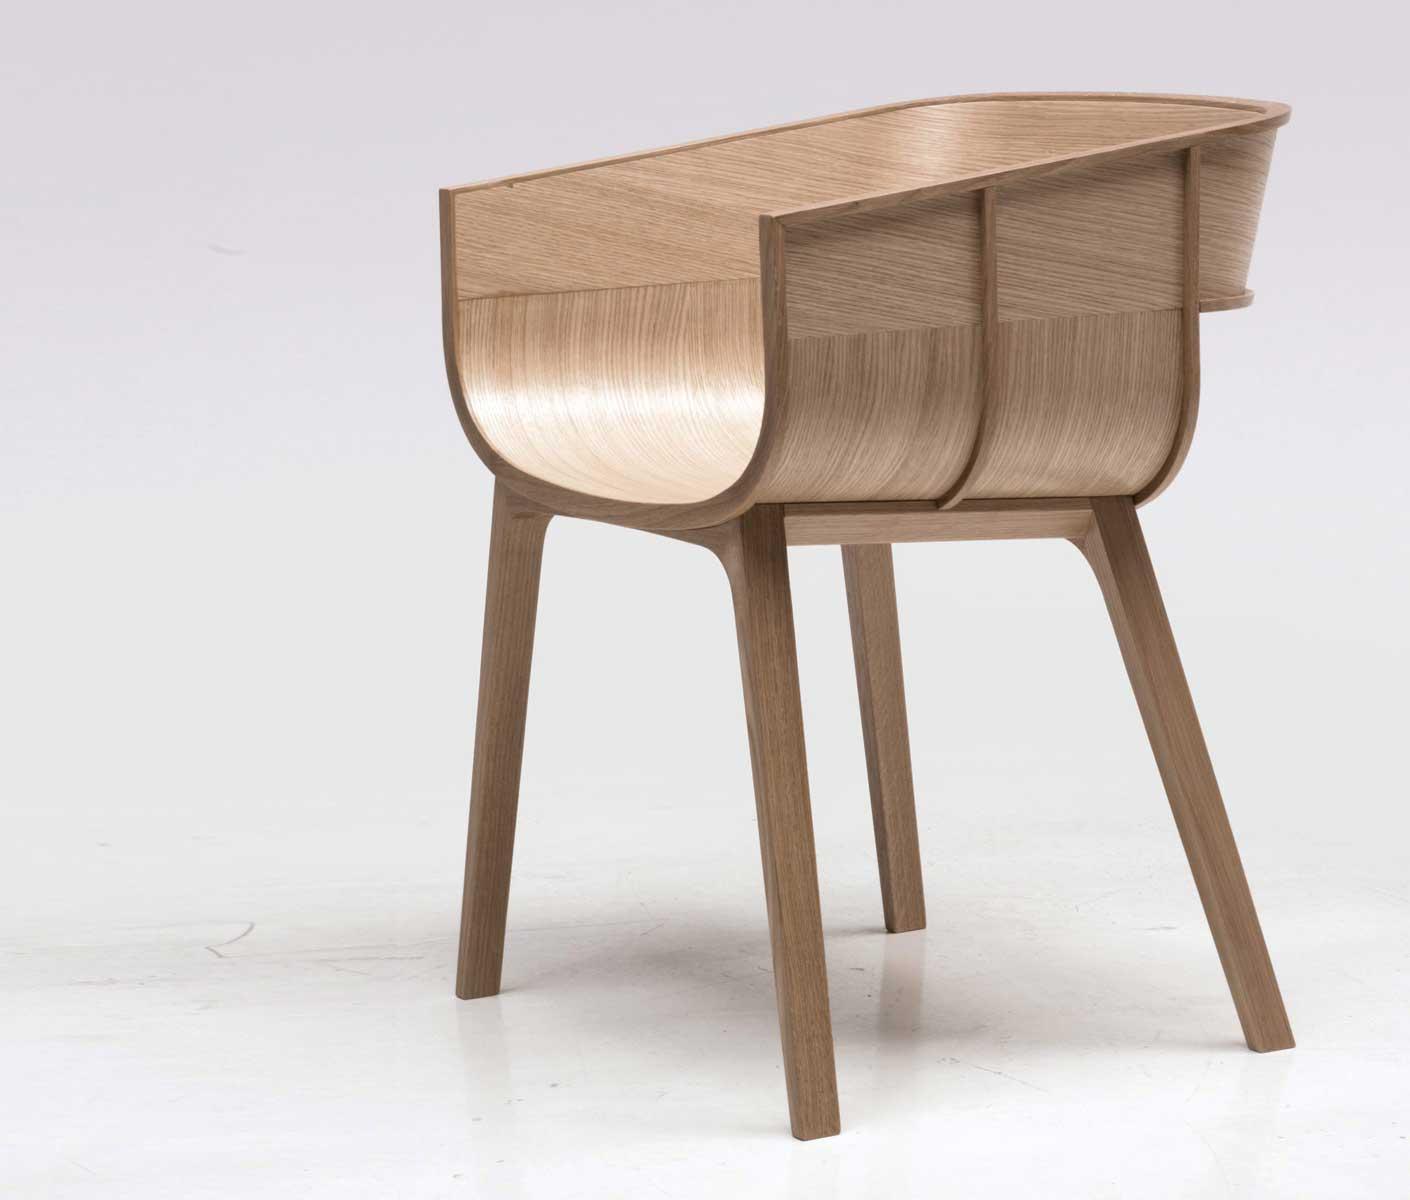 Wood  Furniturebiz  Maritime Chair by Benjamin Hubert